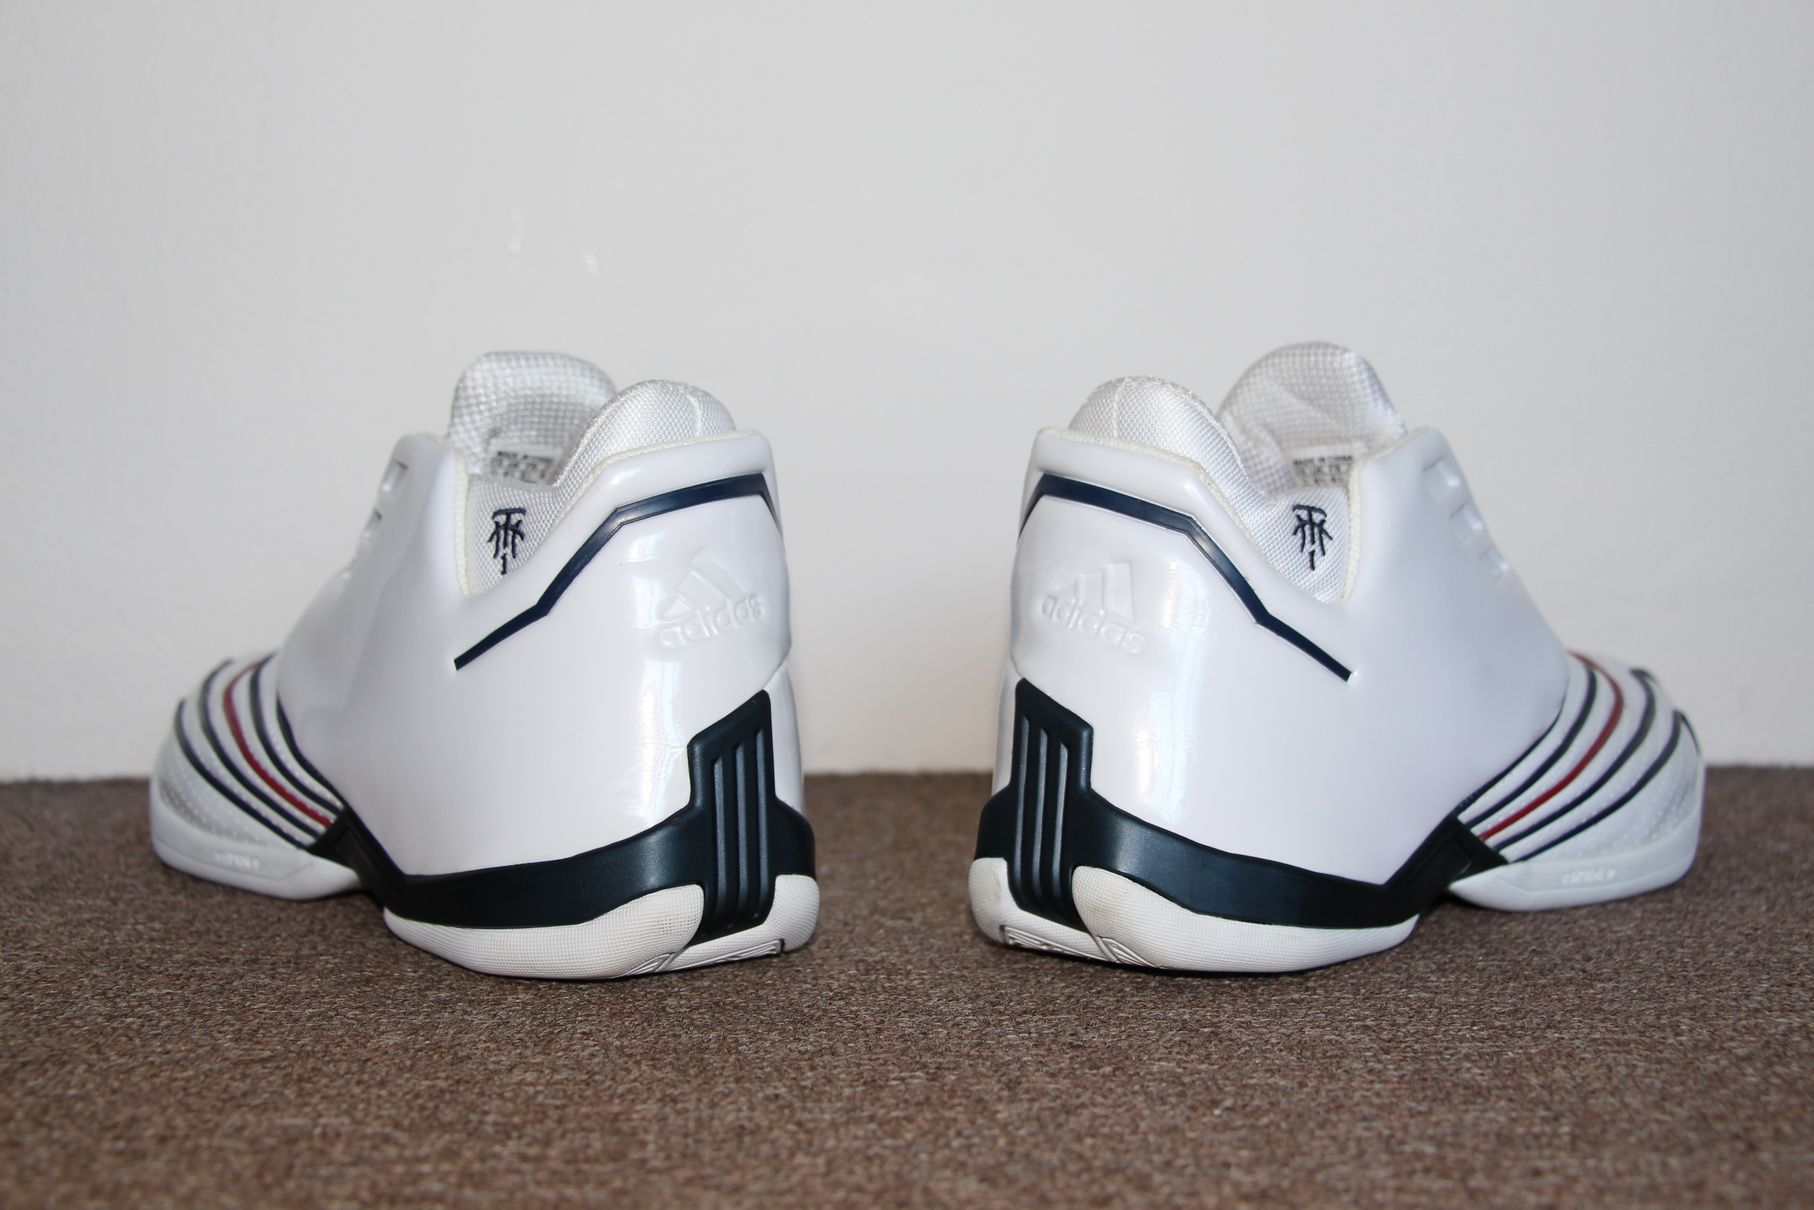 Adidas TMAC 2 'Olympic' 2003 (Red-White/Dark Indigo)   Sneakers ...